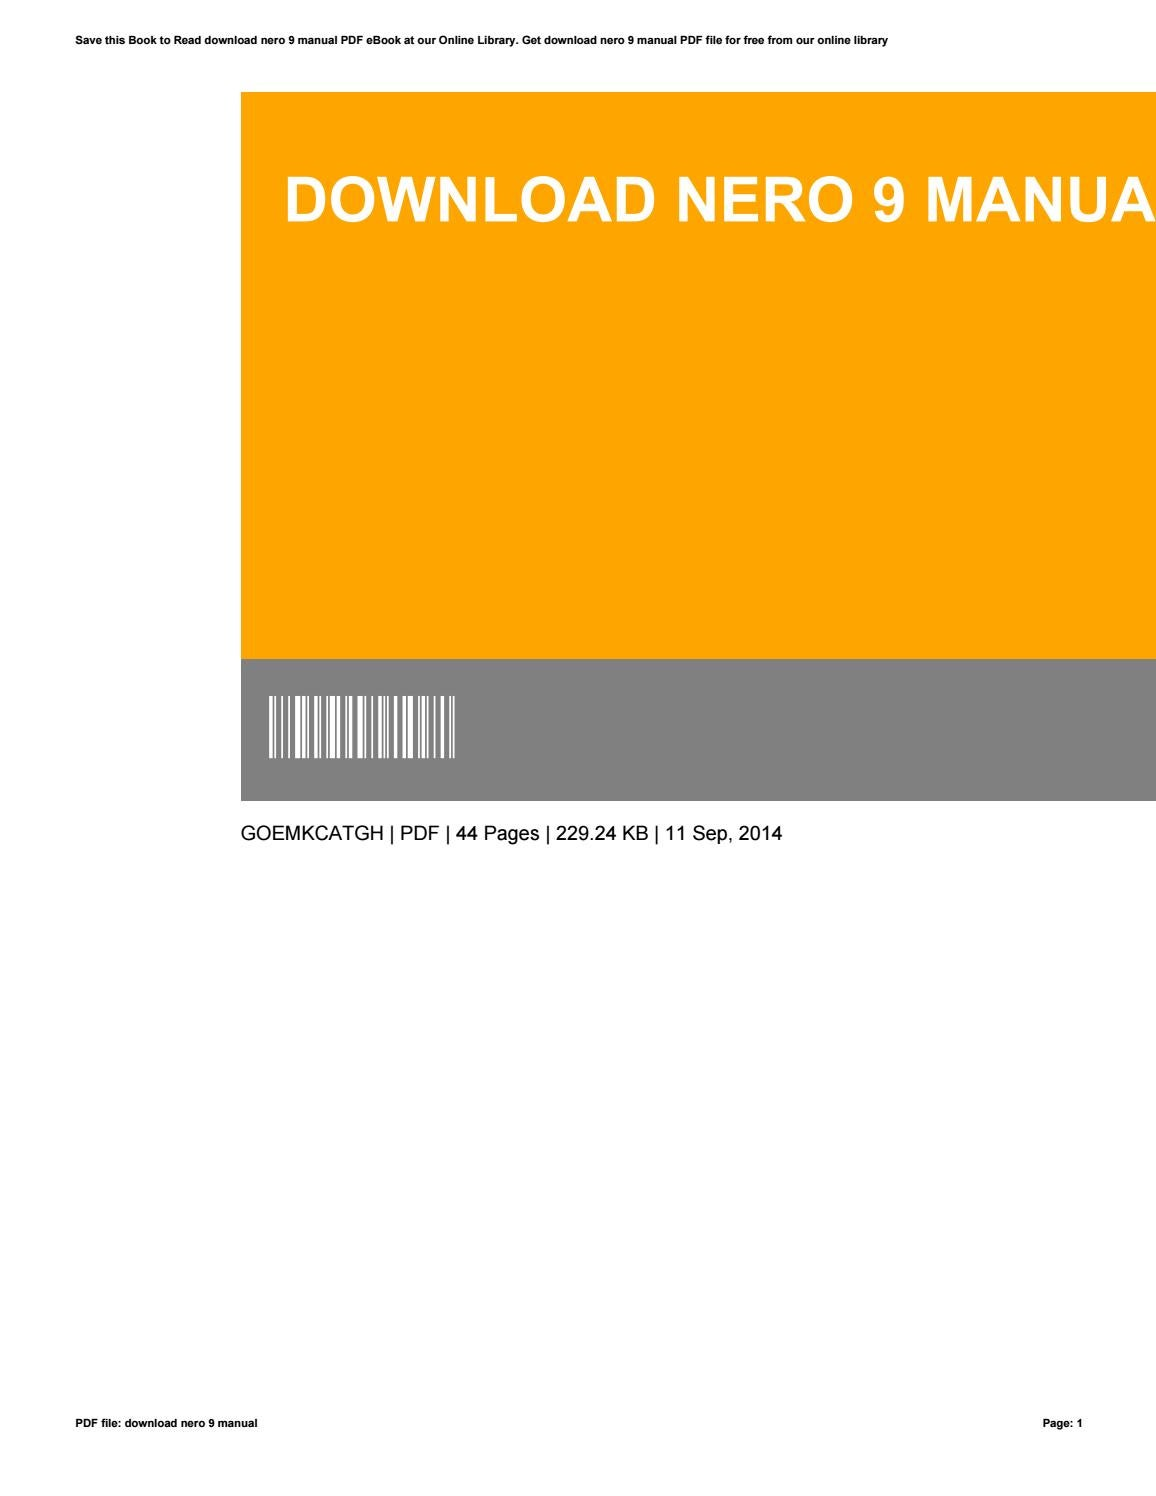 download nero 9 manual by edwardbeeler2812 issuu rh issuu com nero 11 manuals download nero 11 wave editor manual